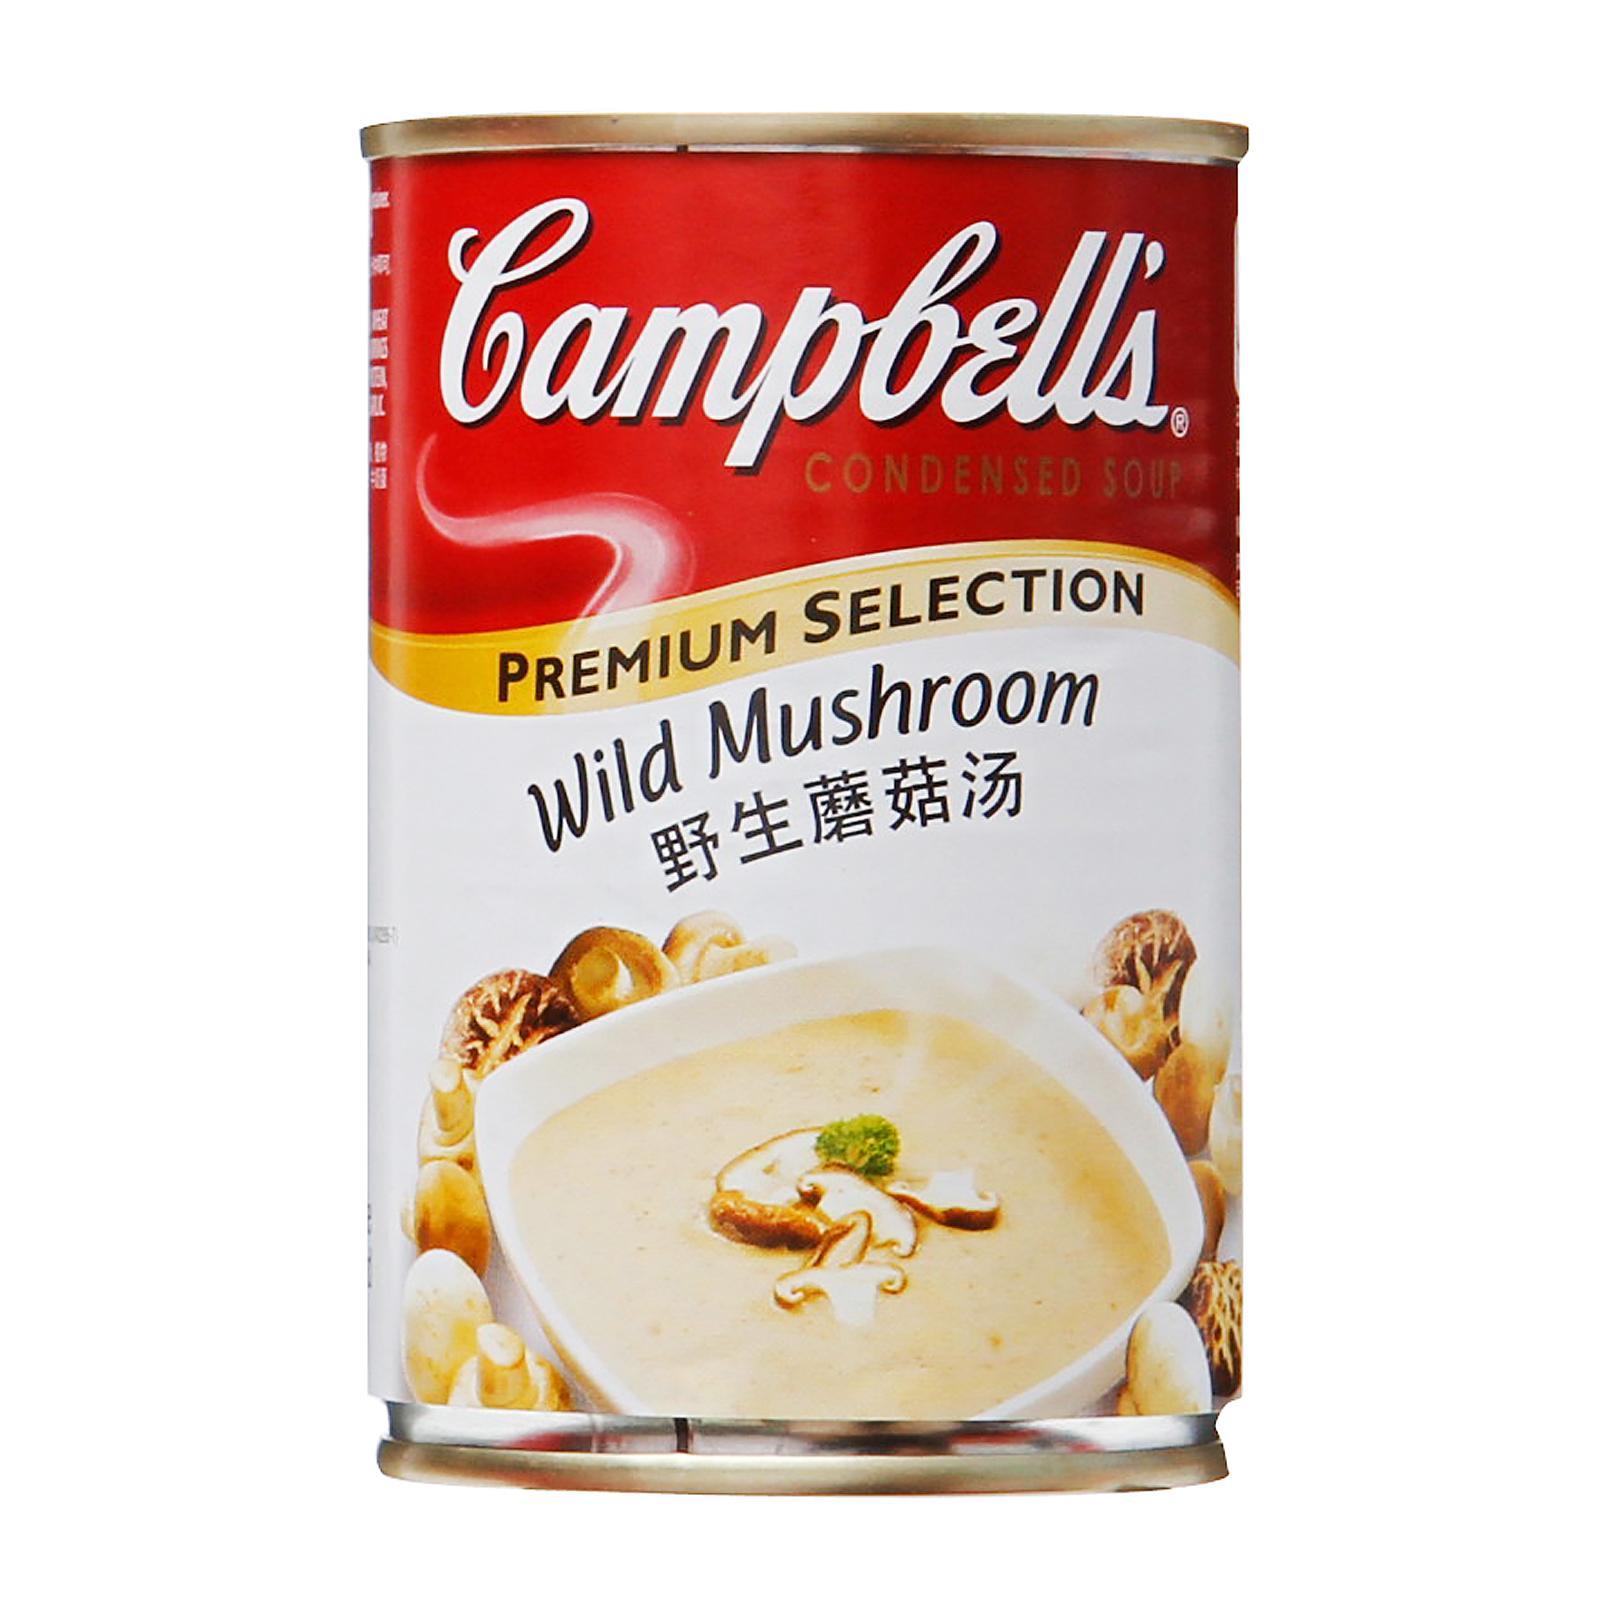 Campbell's Creamy Wild Mushroom Condensed Soup